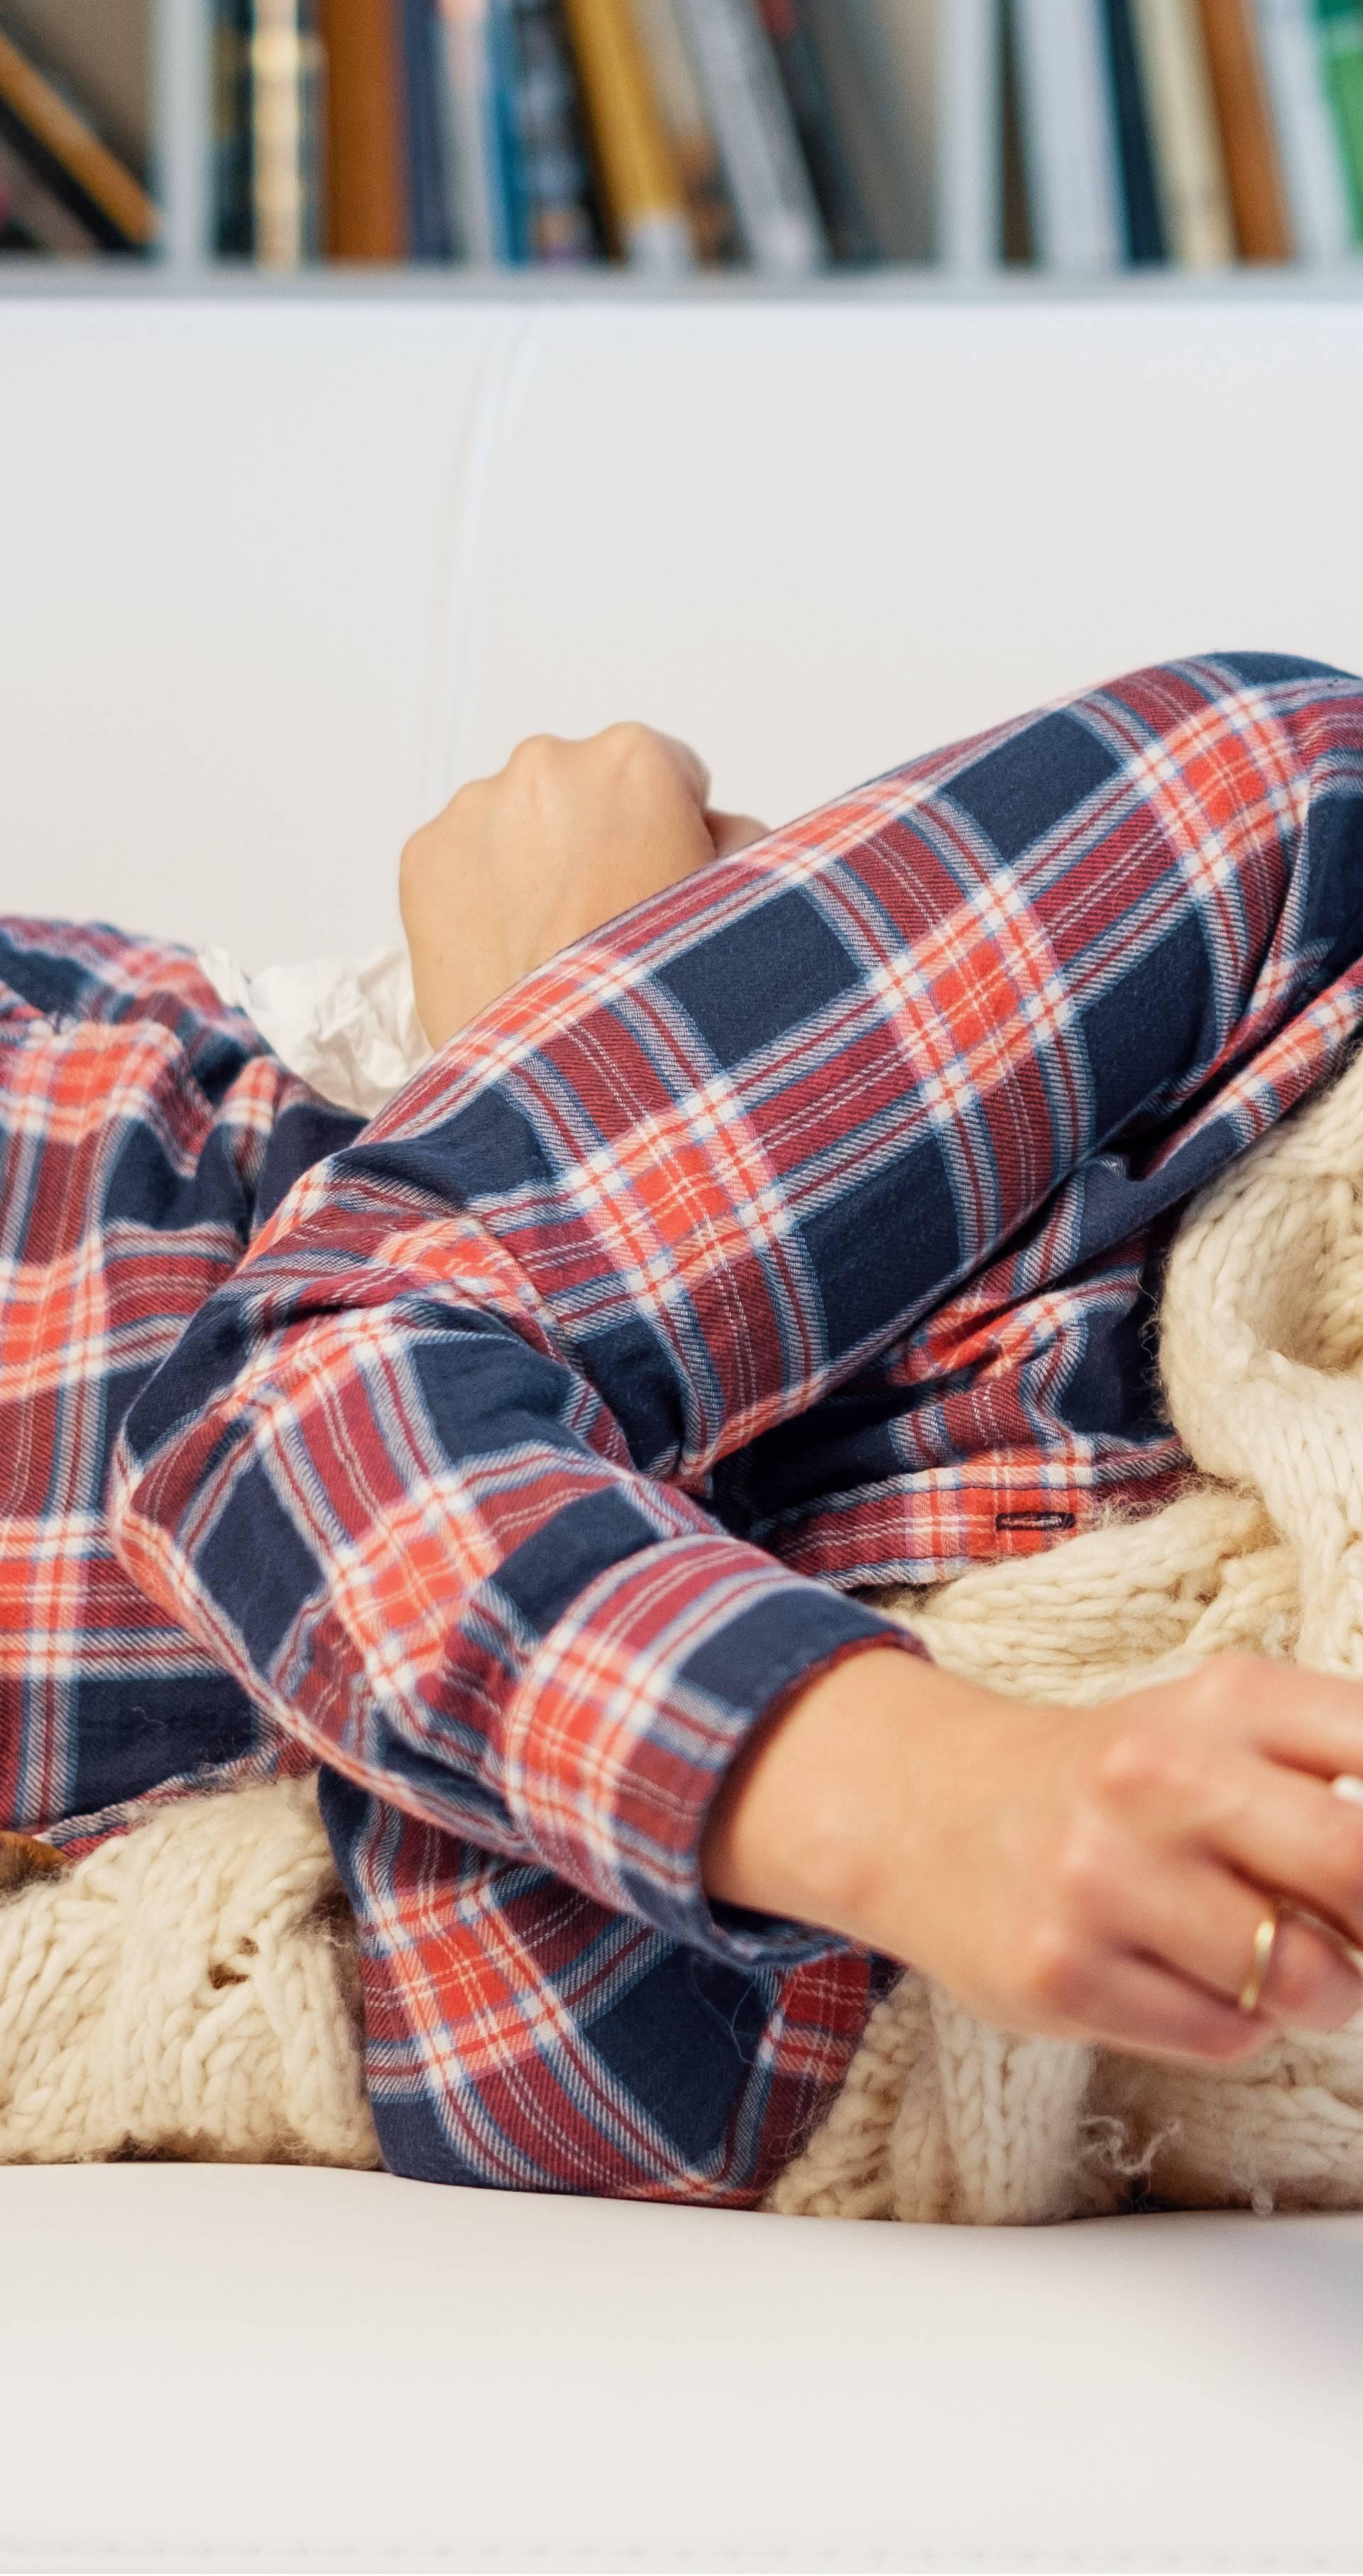 Gripa jenjava: Rekordne sezone po broju oboljelih i preminulih